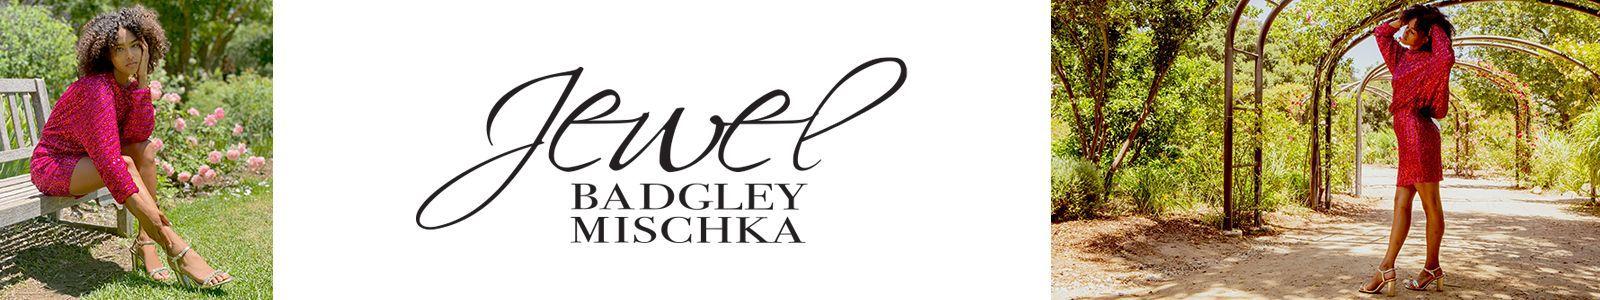 Jewel, Badgley, Mischka